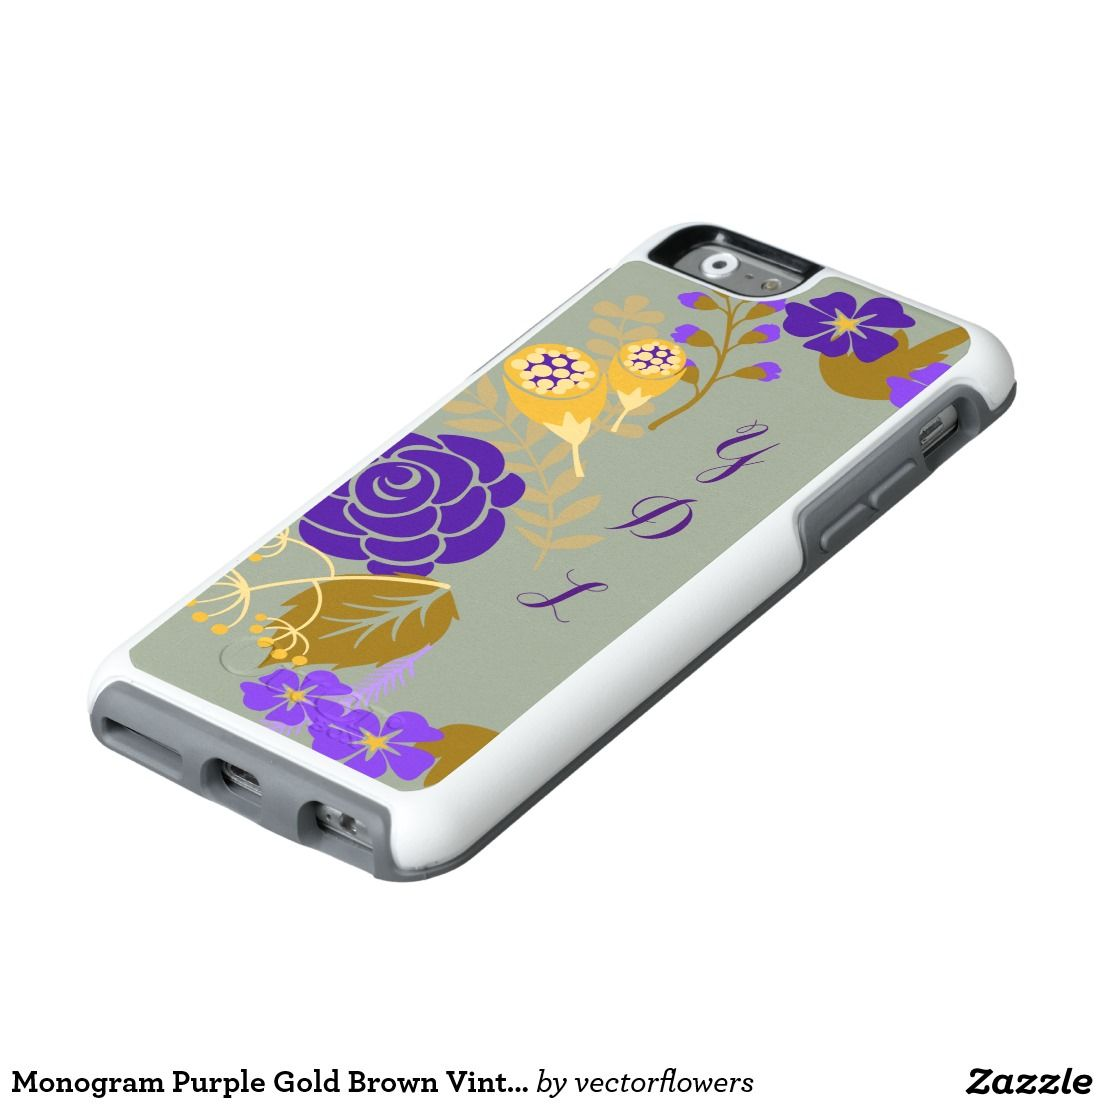 Monogram purple gold brown vintage floral pattern otterbox